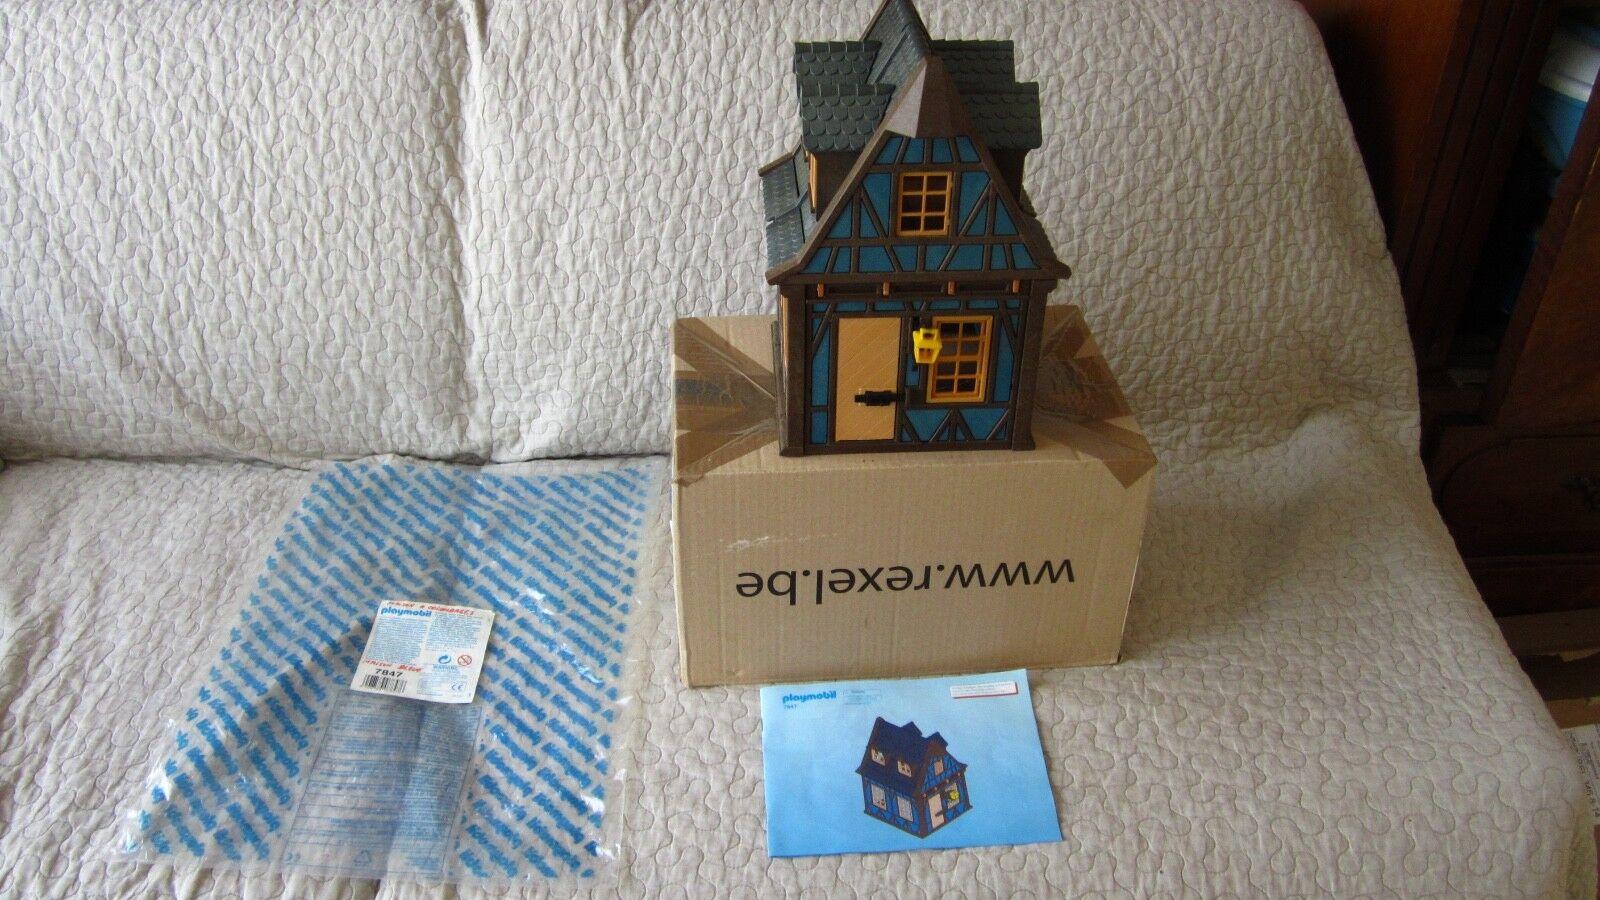 Playmobil 7847 House huis maison Médiéval chevalier Castle fakwerhaus